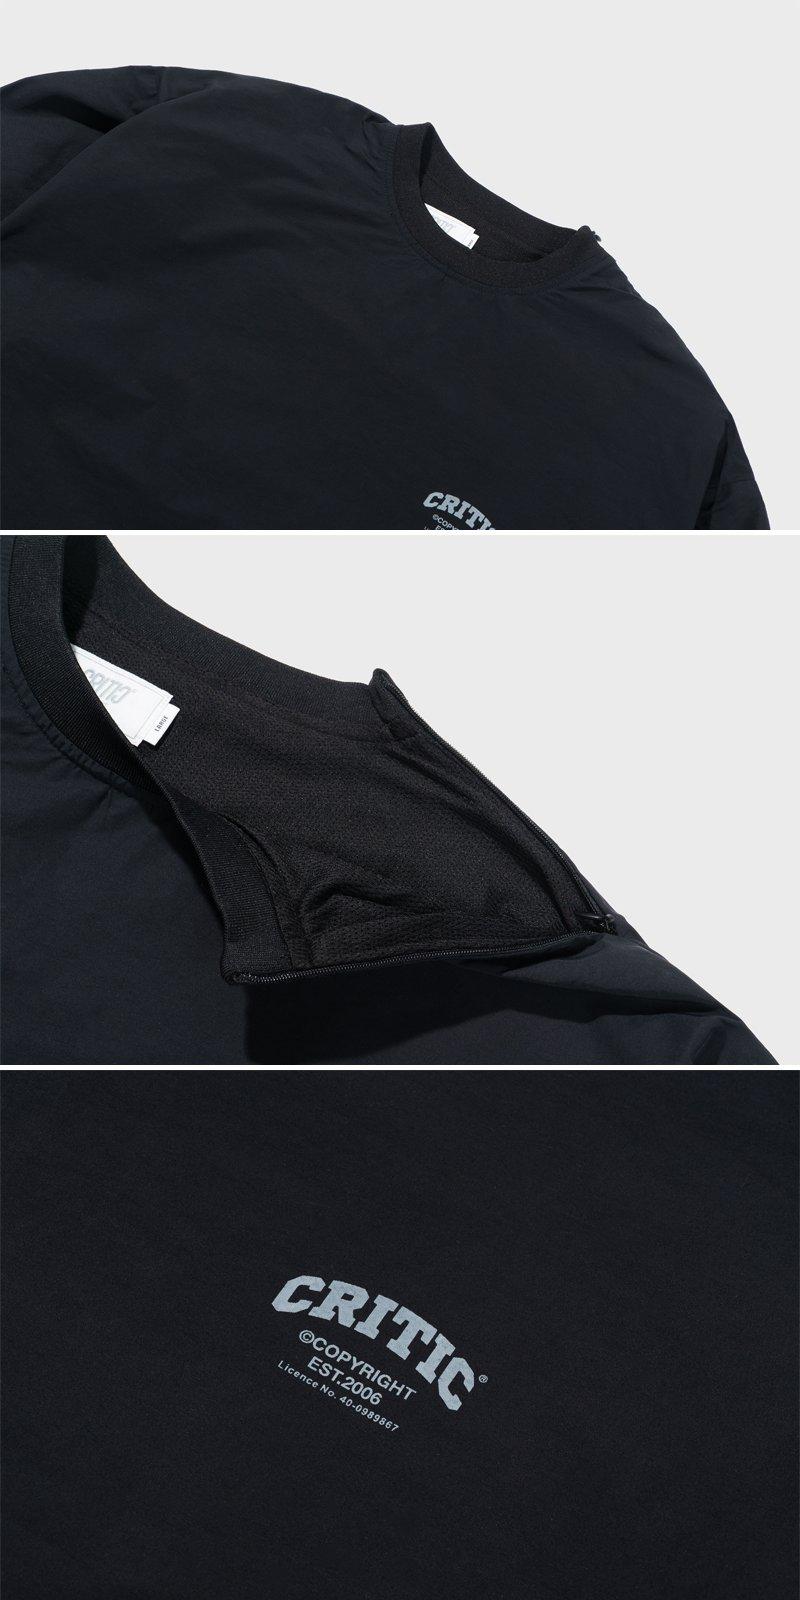 NYLON WARM UP SHIRTS(BLACK)_CTTZICR03UC6